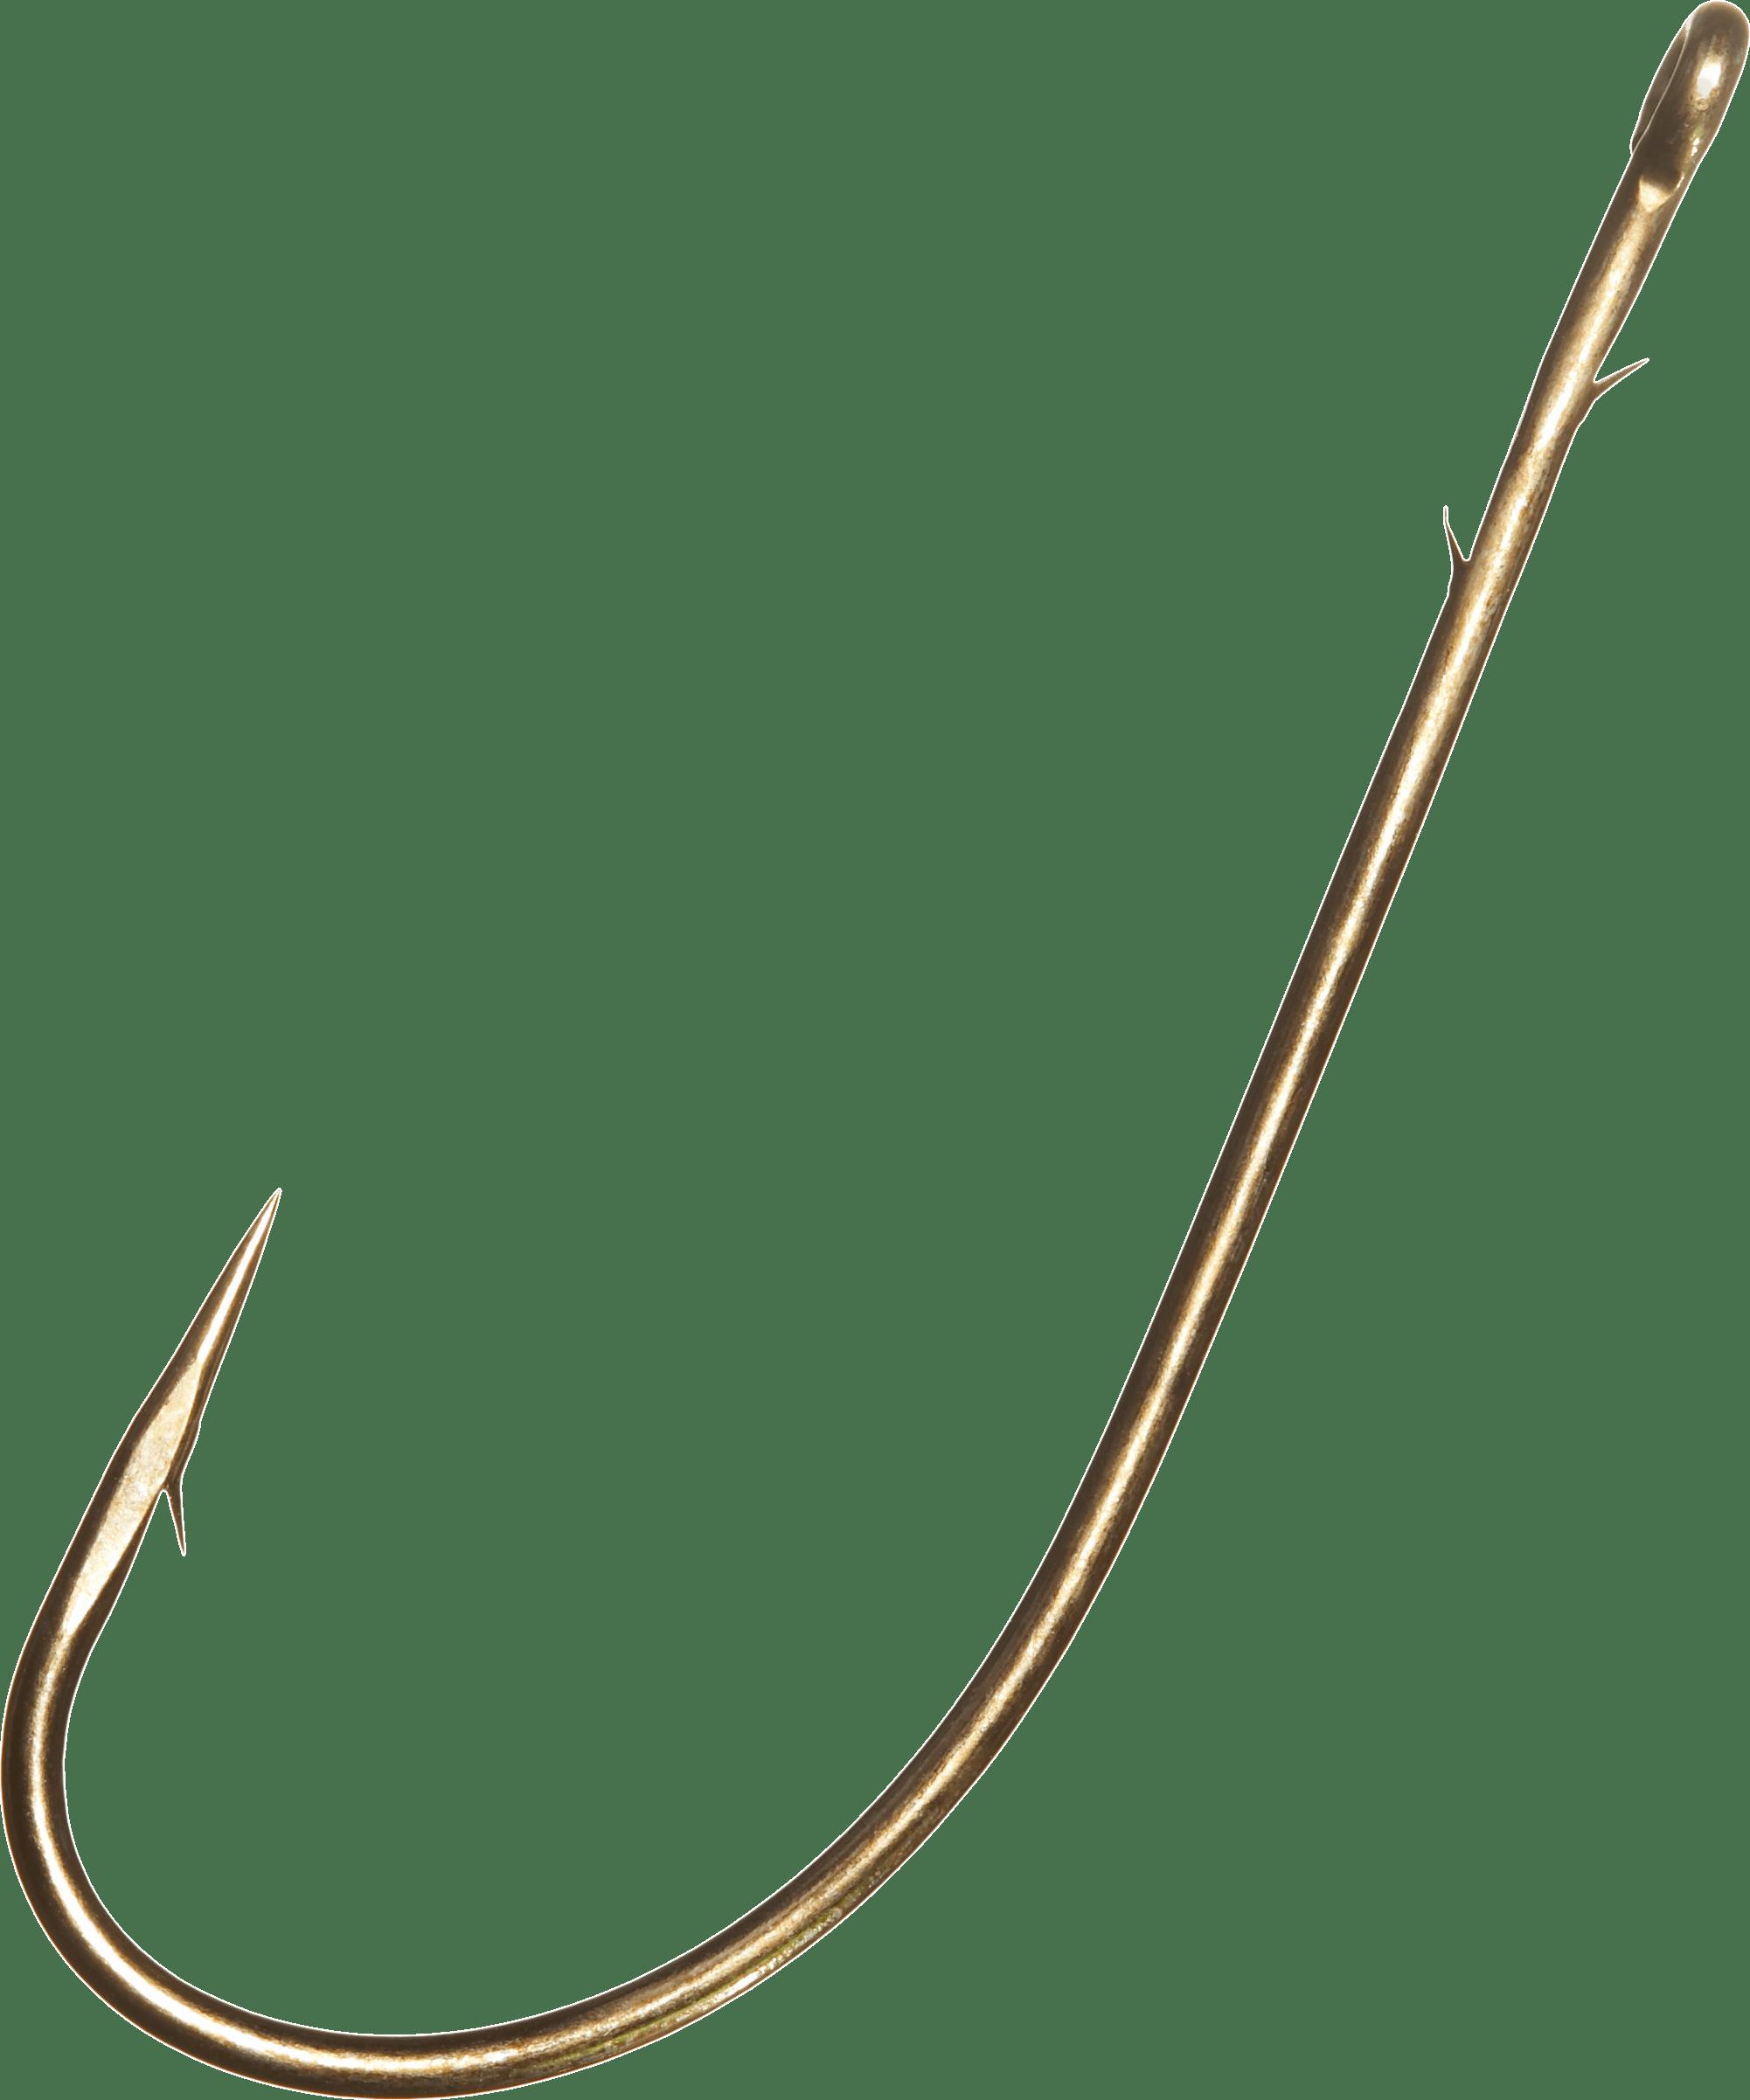 Large Fish Hook transparent PNG.